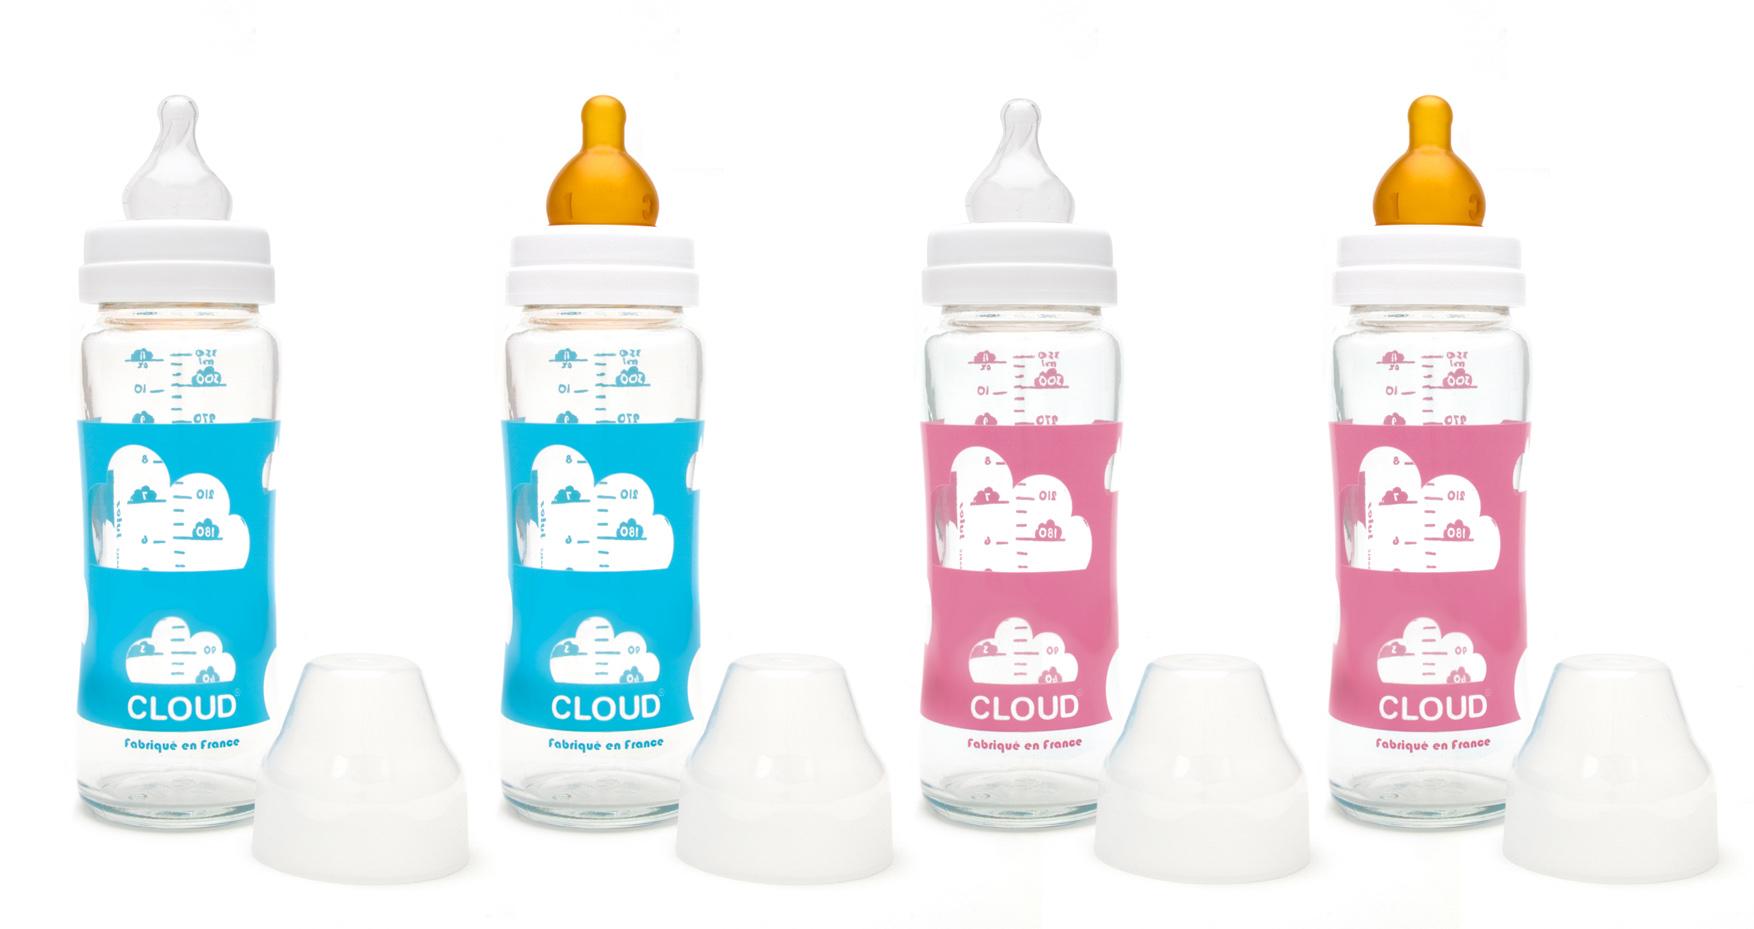 biberons en verre made in france biberons cloud. Black Bedroom Furniture Sets. Home Design Ideas